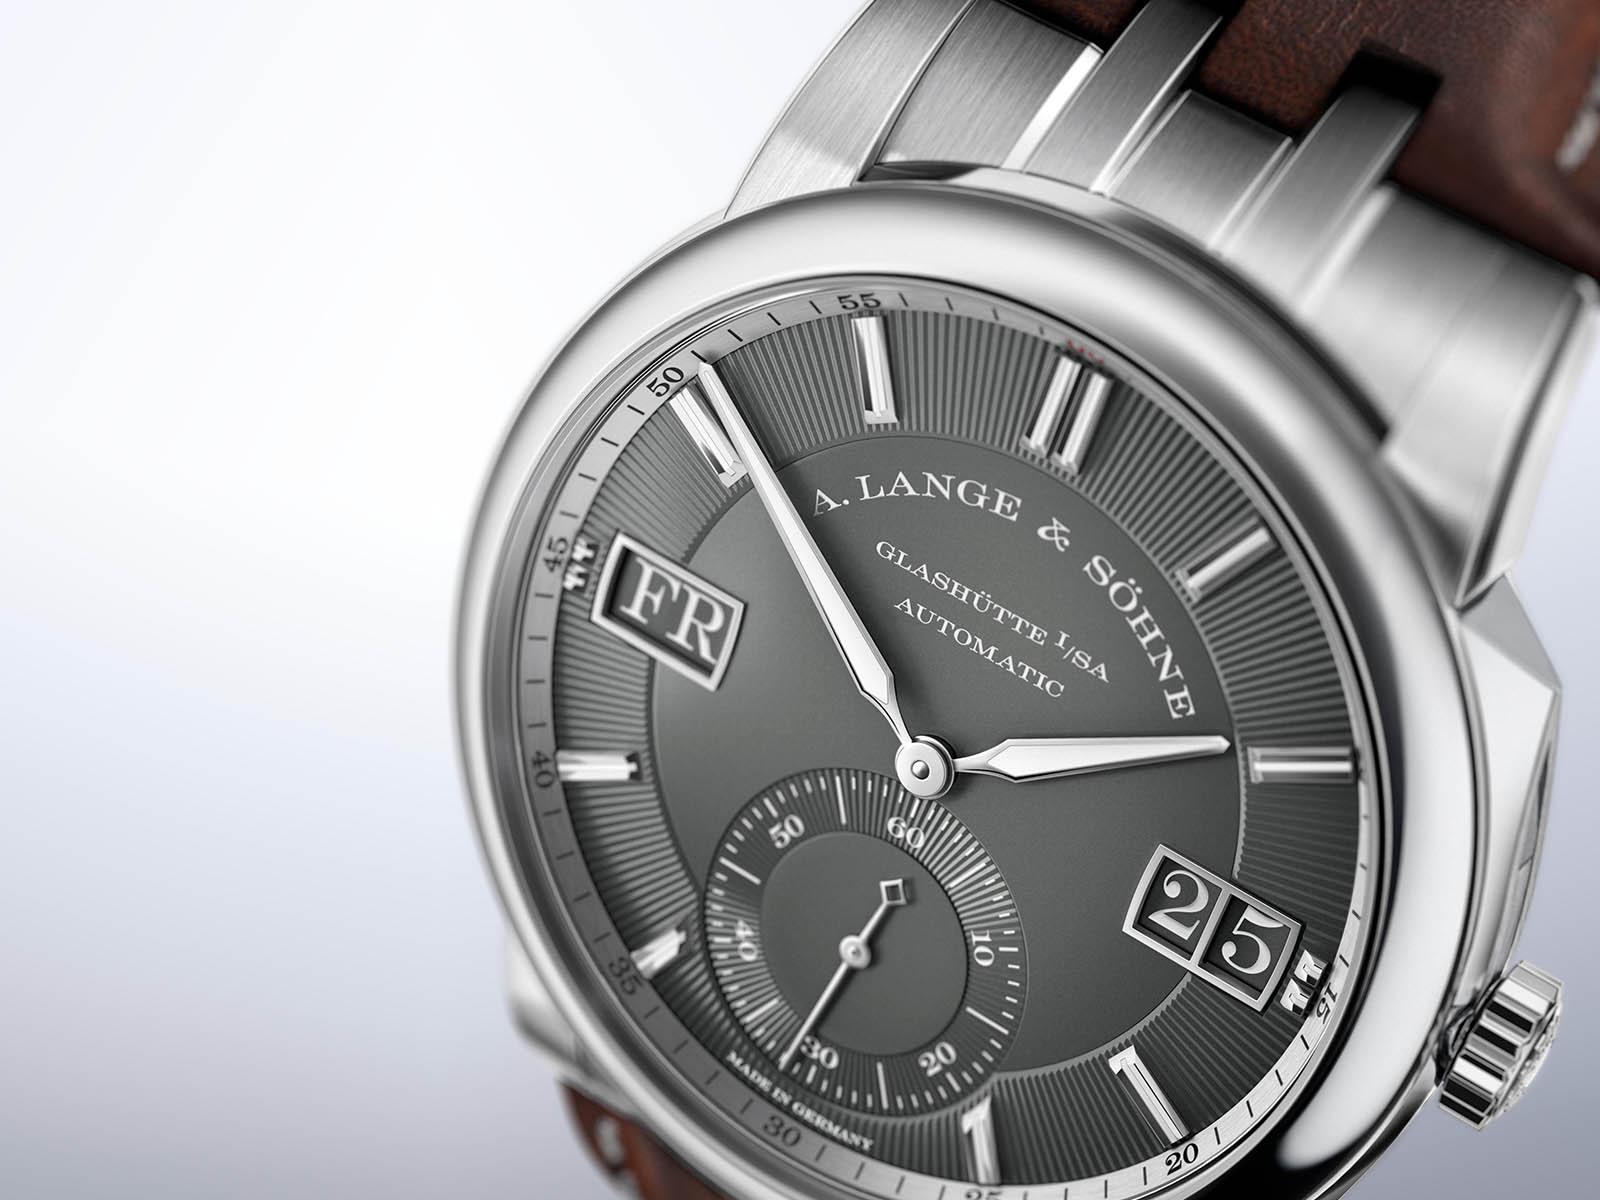 363-038-a-lange-sohne-odysseus-watch-wonders-2020-2.jpg